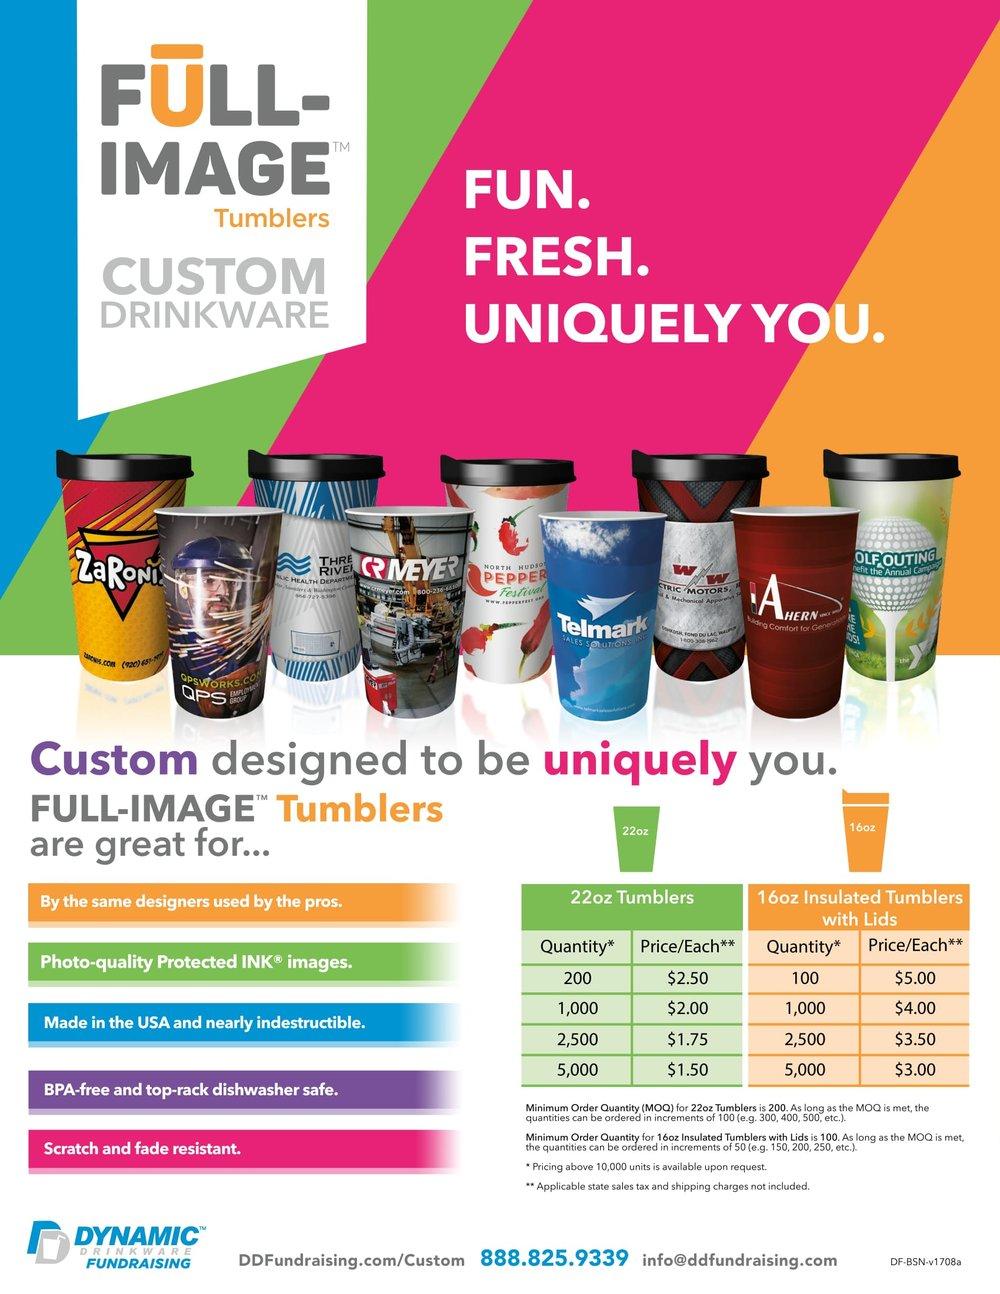 Custom-Drinkware-Business-1.jpg